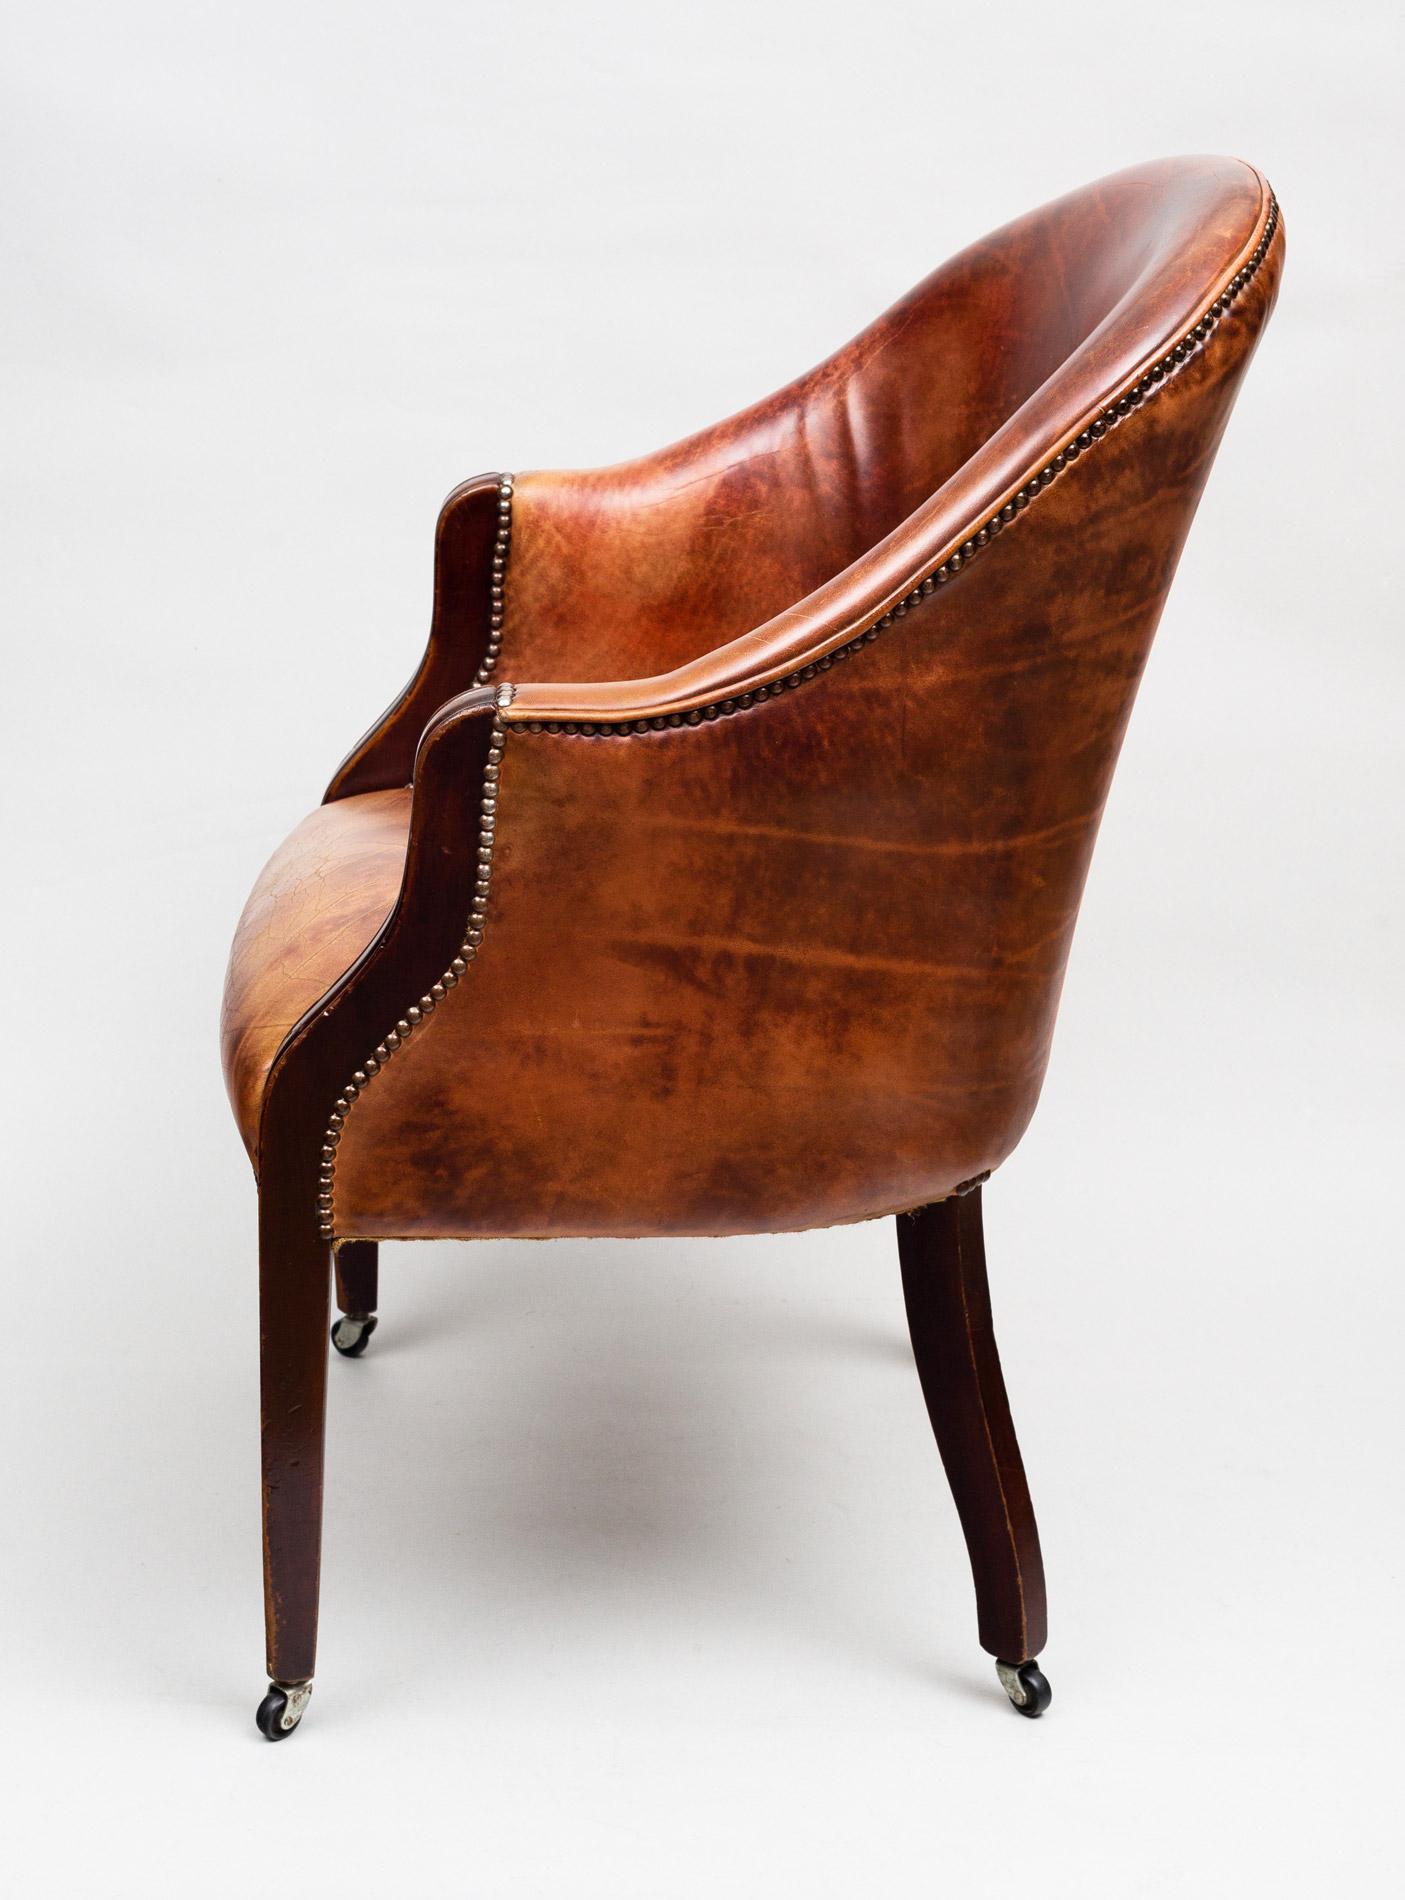 ... Edwardian Leather Tub Chair ... - Antique Edwardian Tub Chair Antique Mahogany Leather Tub Chair